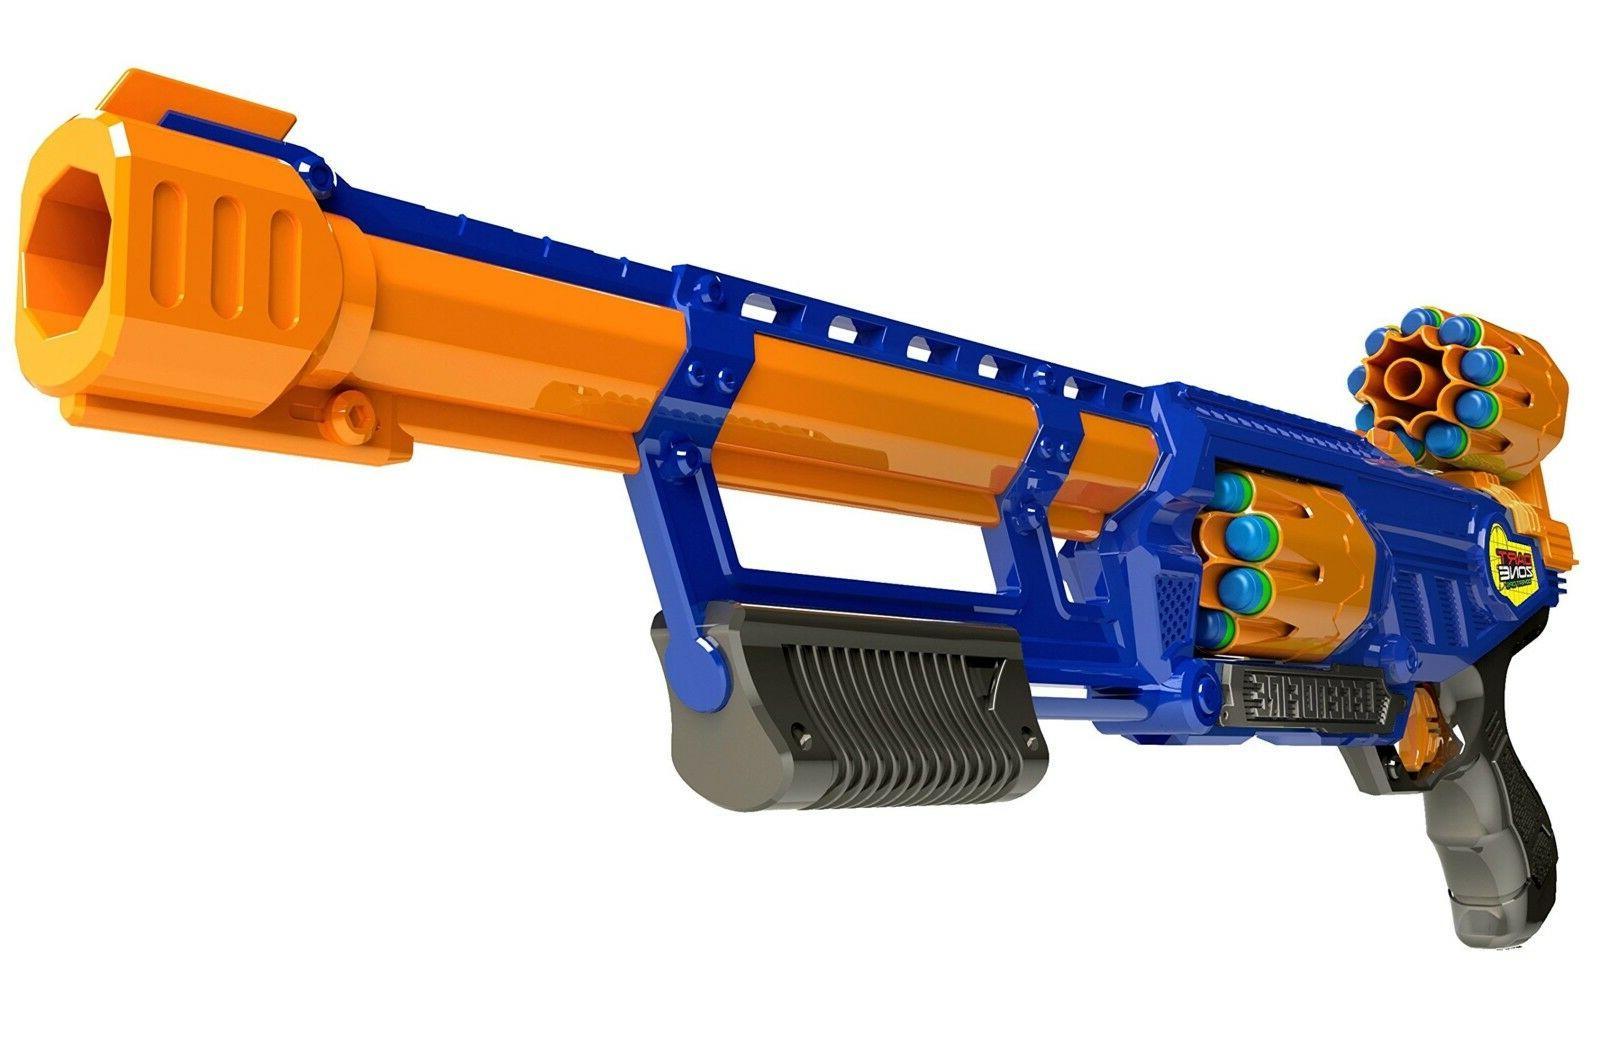 legendfire powershot blaster